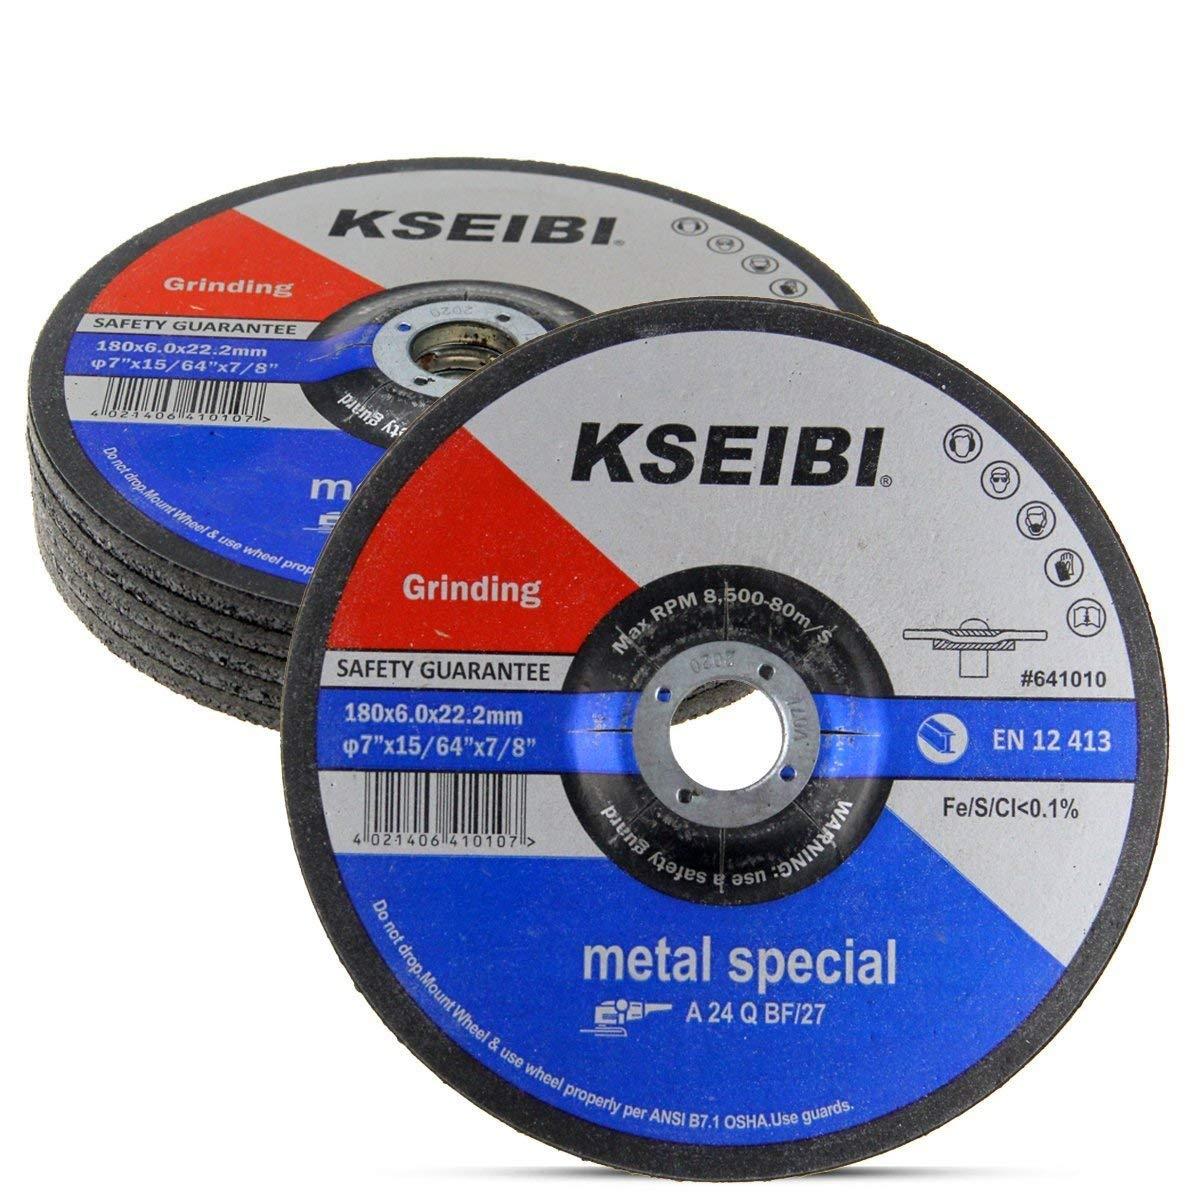 KSEIBI 641014 9-Inch by 1//4-Inch Metal Stainless Steel INOX Grinding Disc Depressed Center Grind Wheel 10-Pack 7//8-Inch Arbor